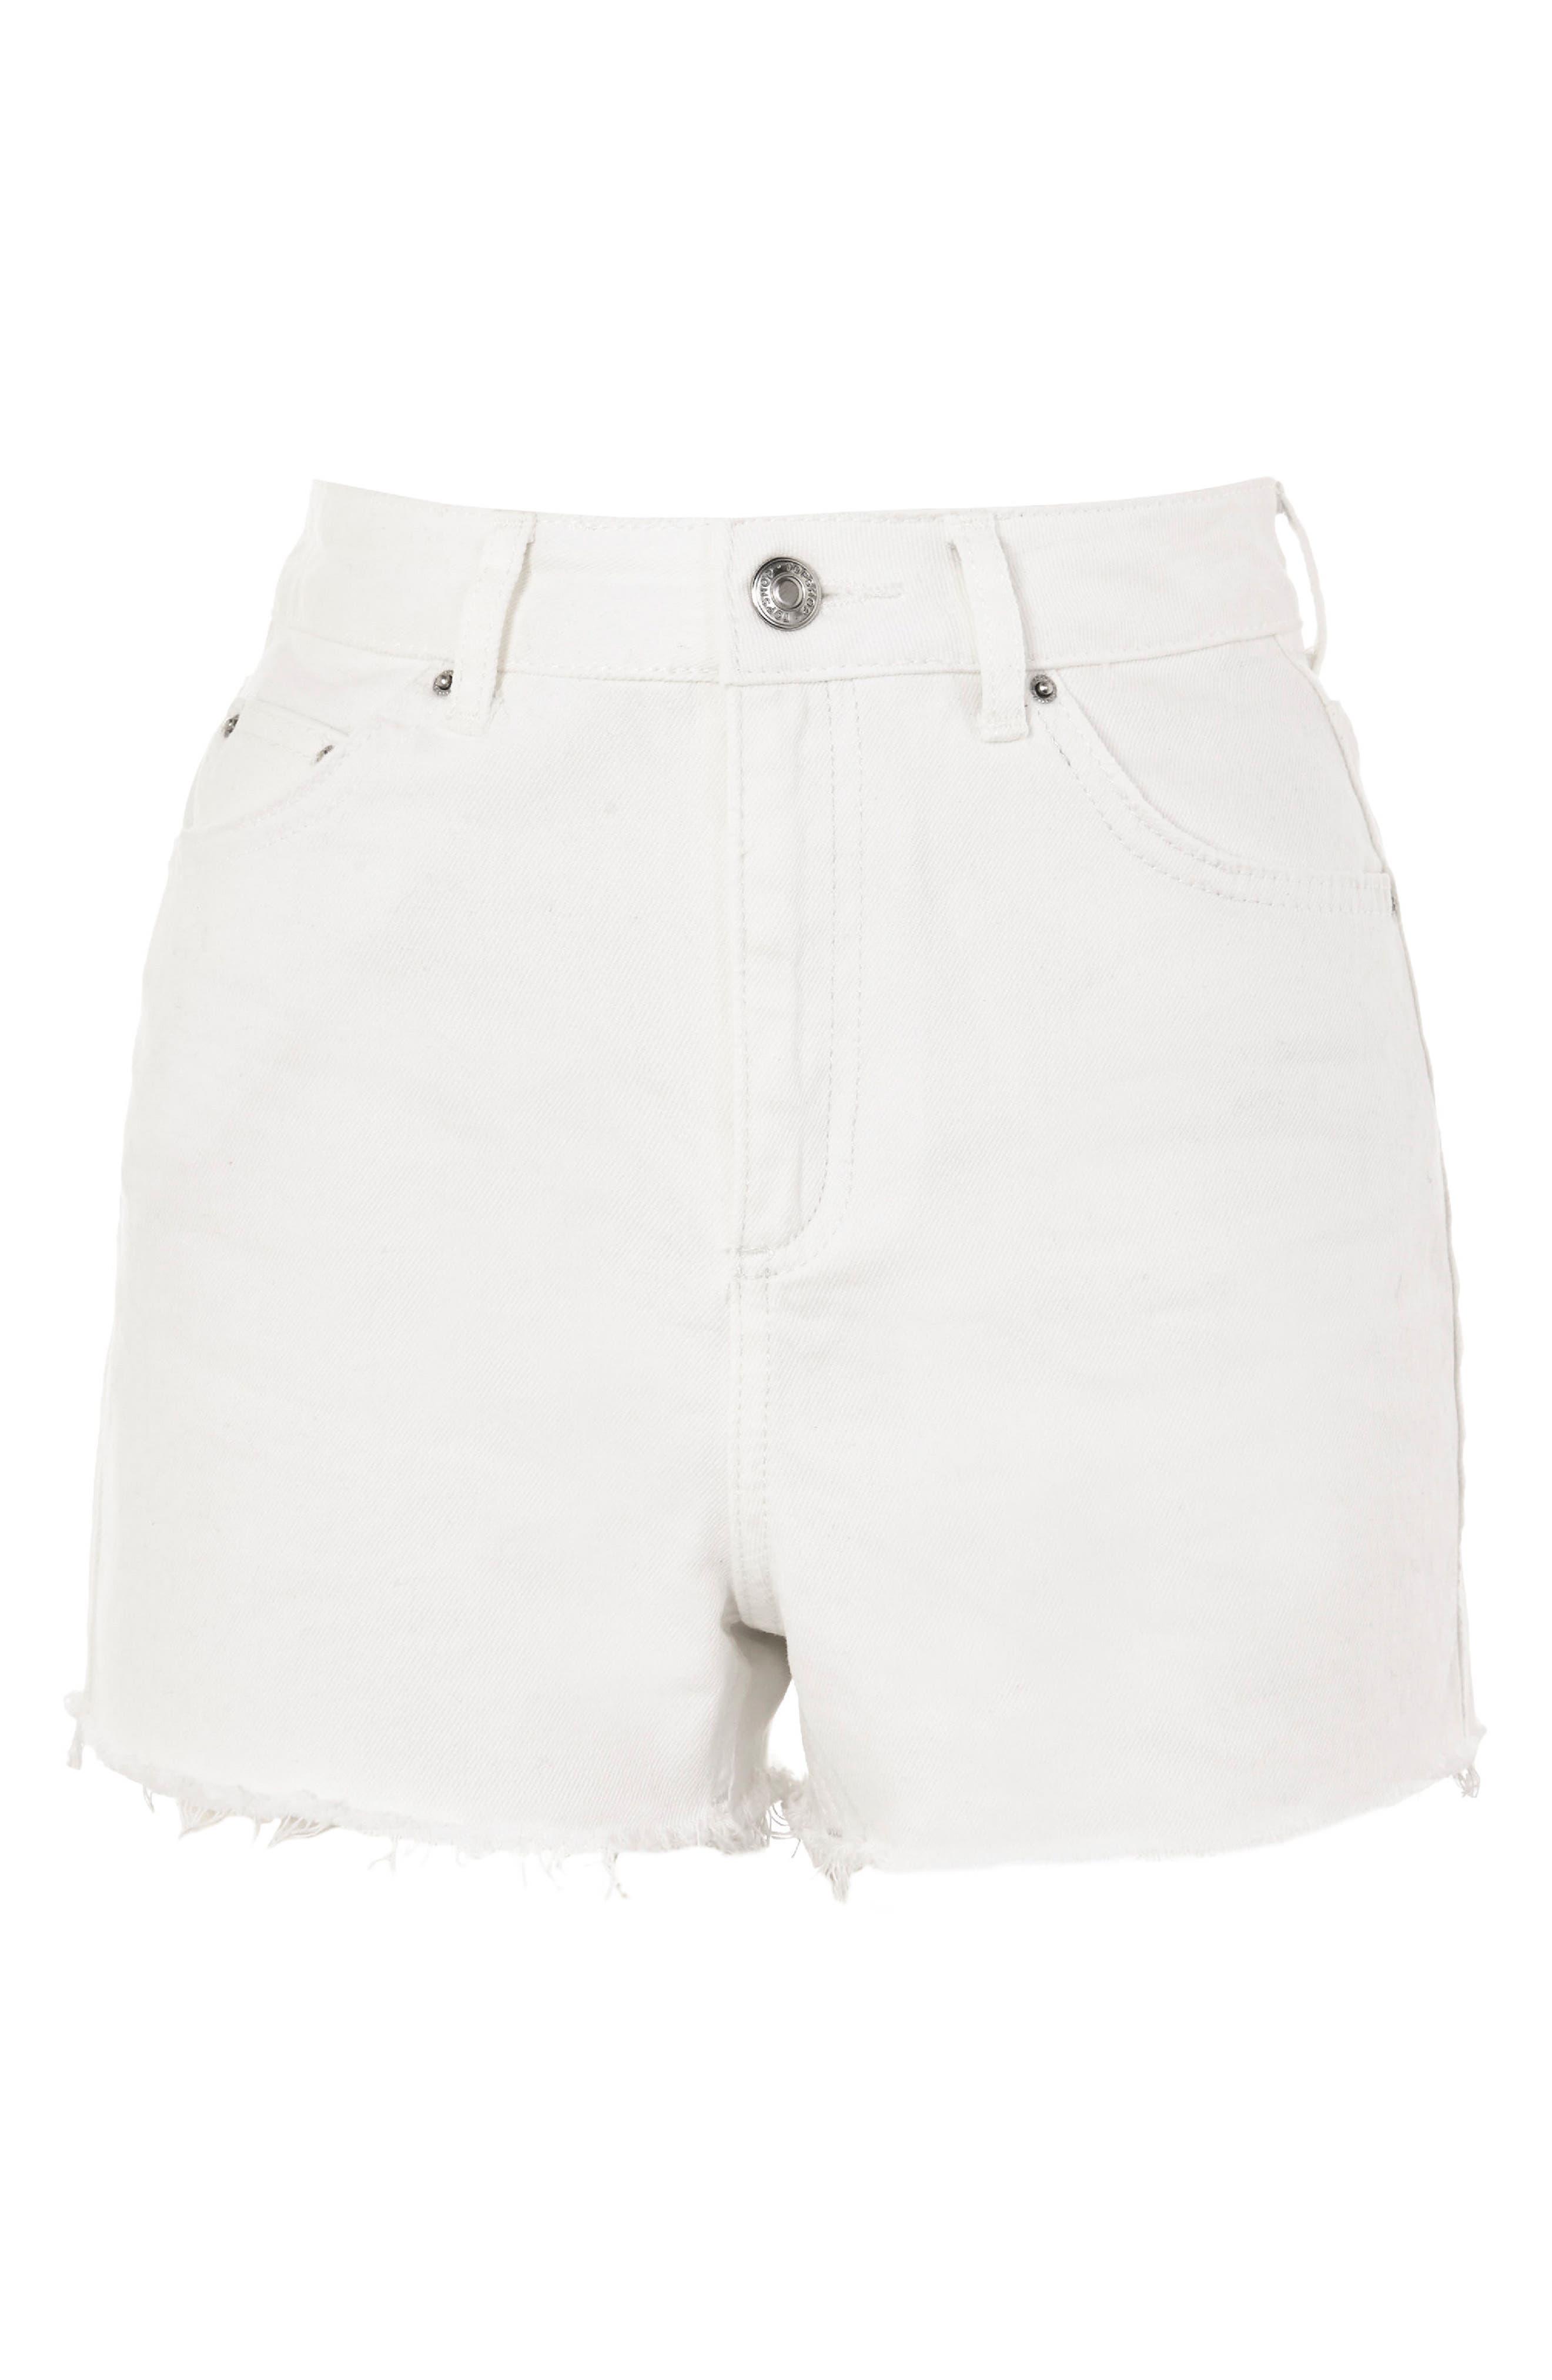 Cutoff Denim Mom Shorts,                             Alternate thumbnail 3, color,                             White